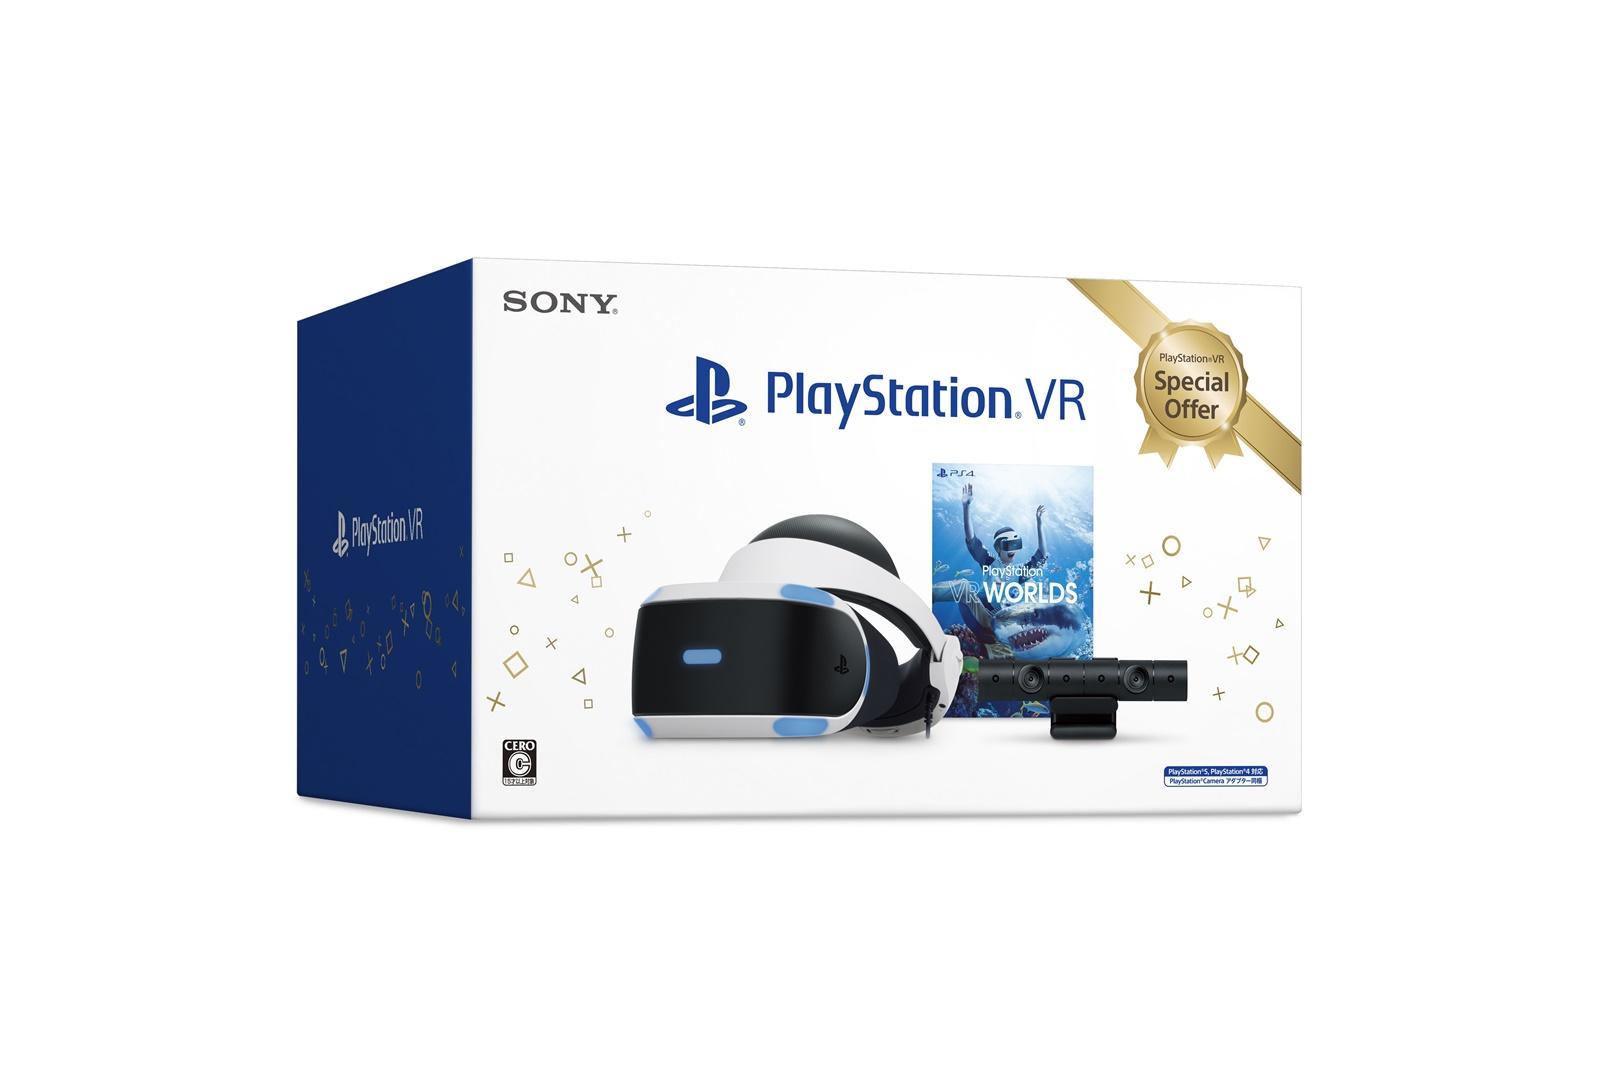 「PlayStation VR Special Offer 2020 Winter」